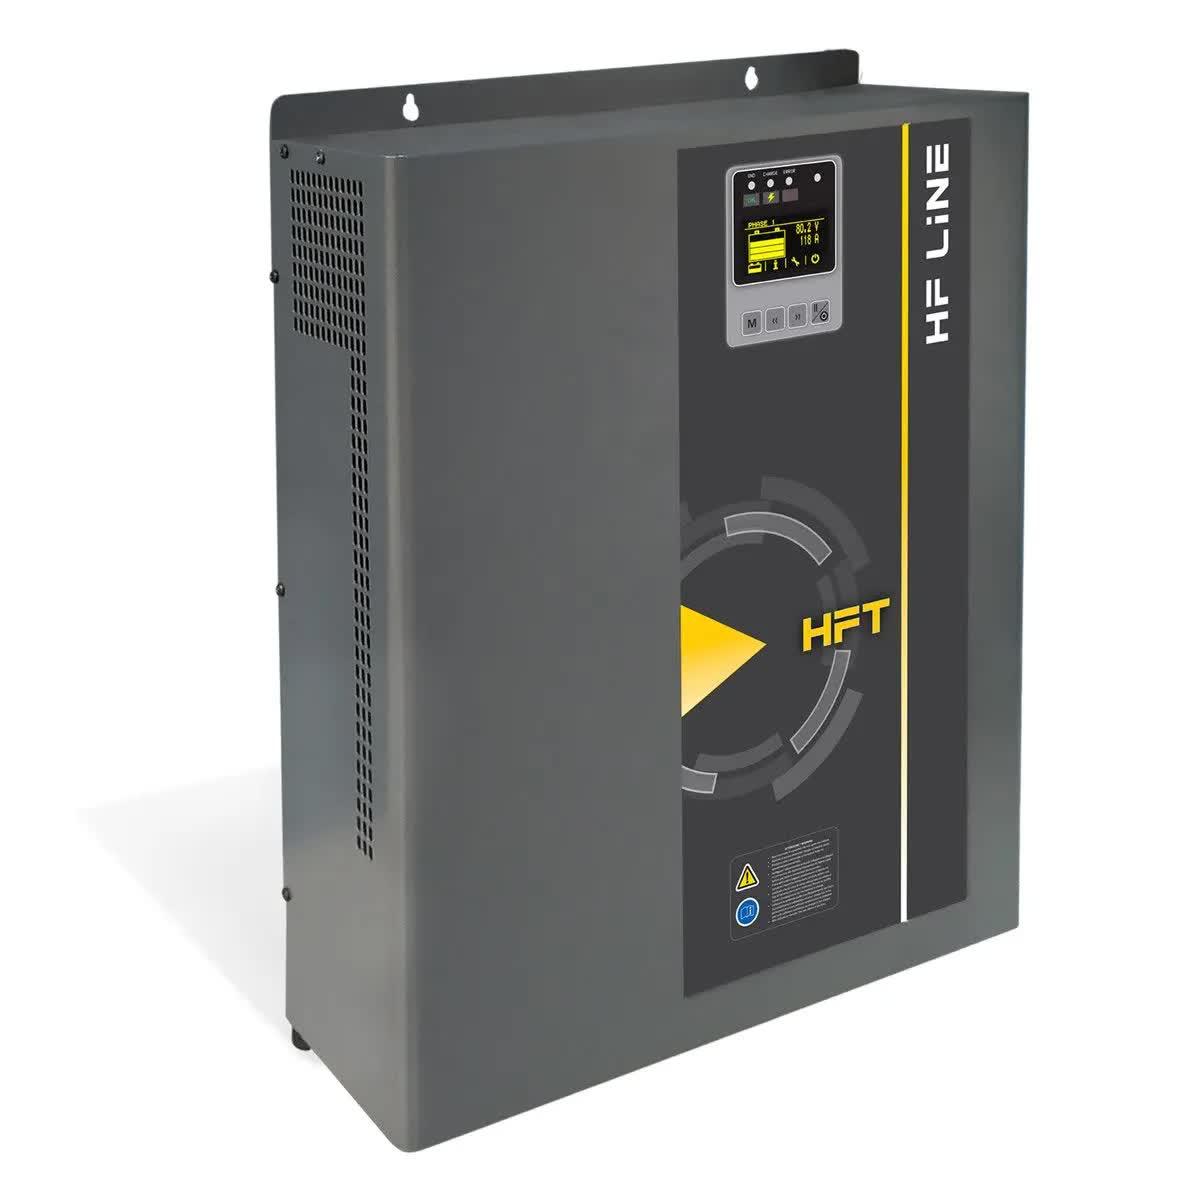 Batterieladegeräte für Gabelstapler, Italien, ATIB Elettronica